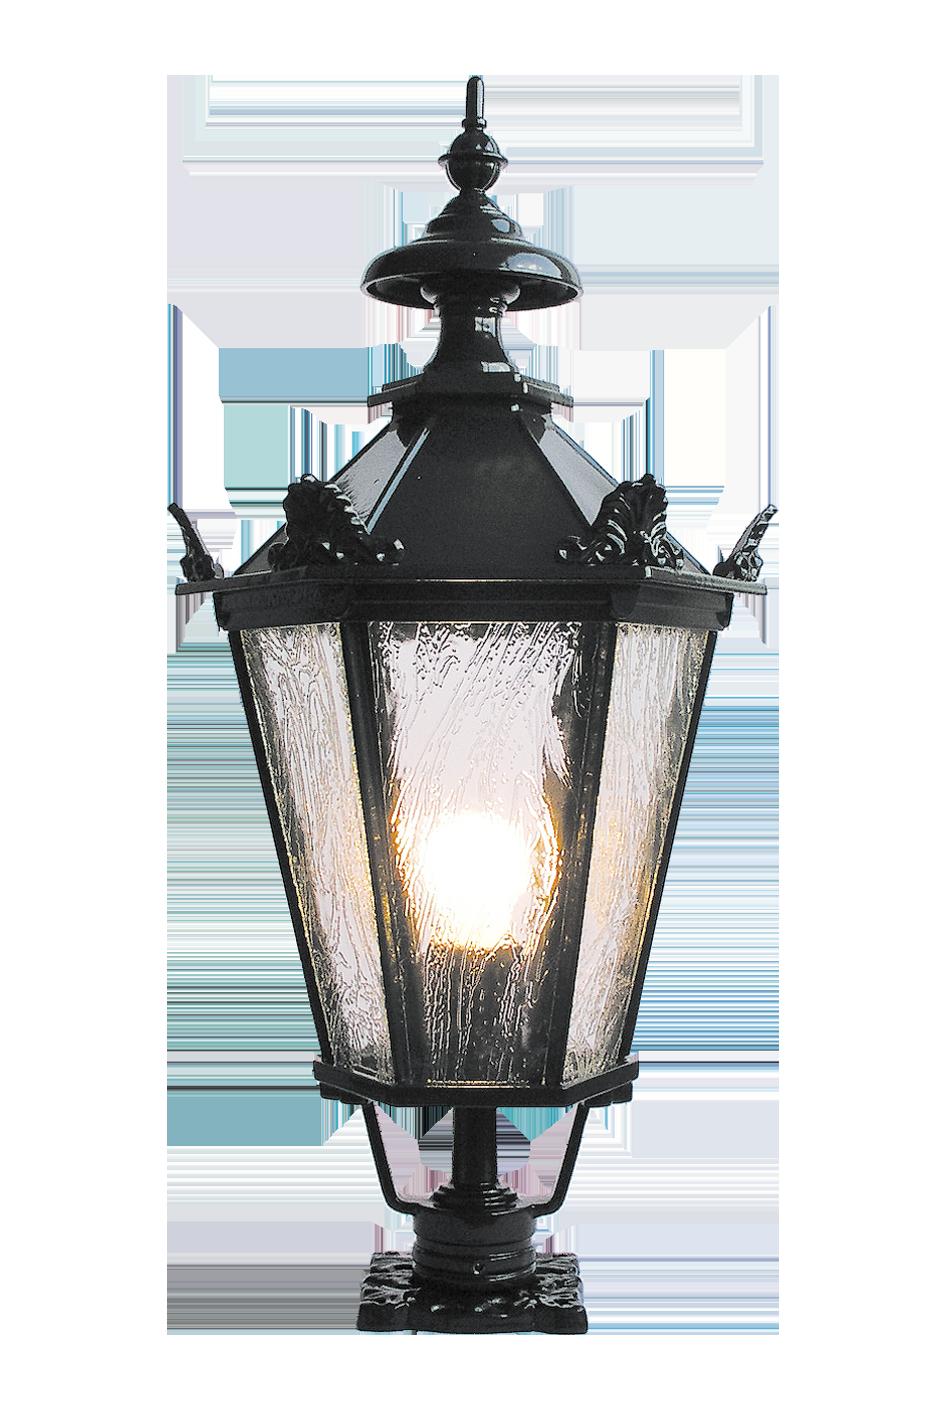 Ornamentglas | Antiqua Guliker GmbH